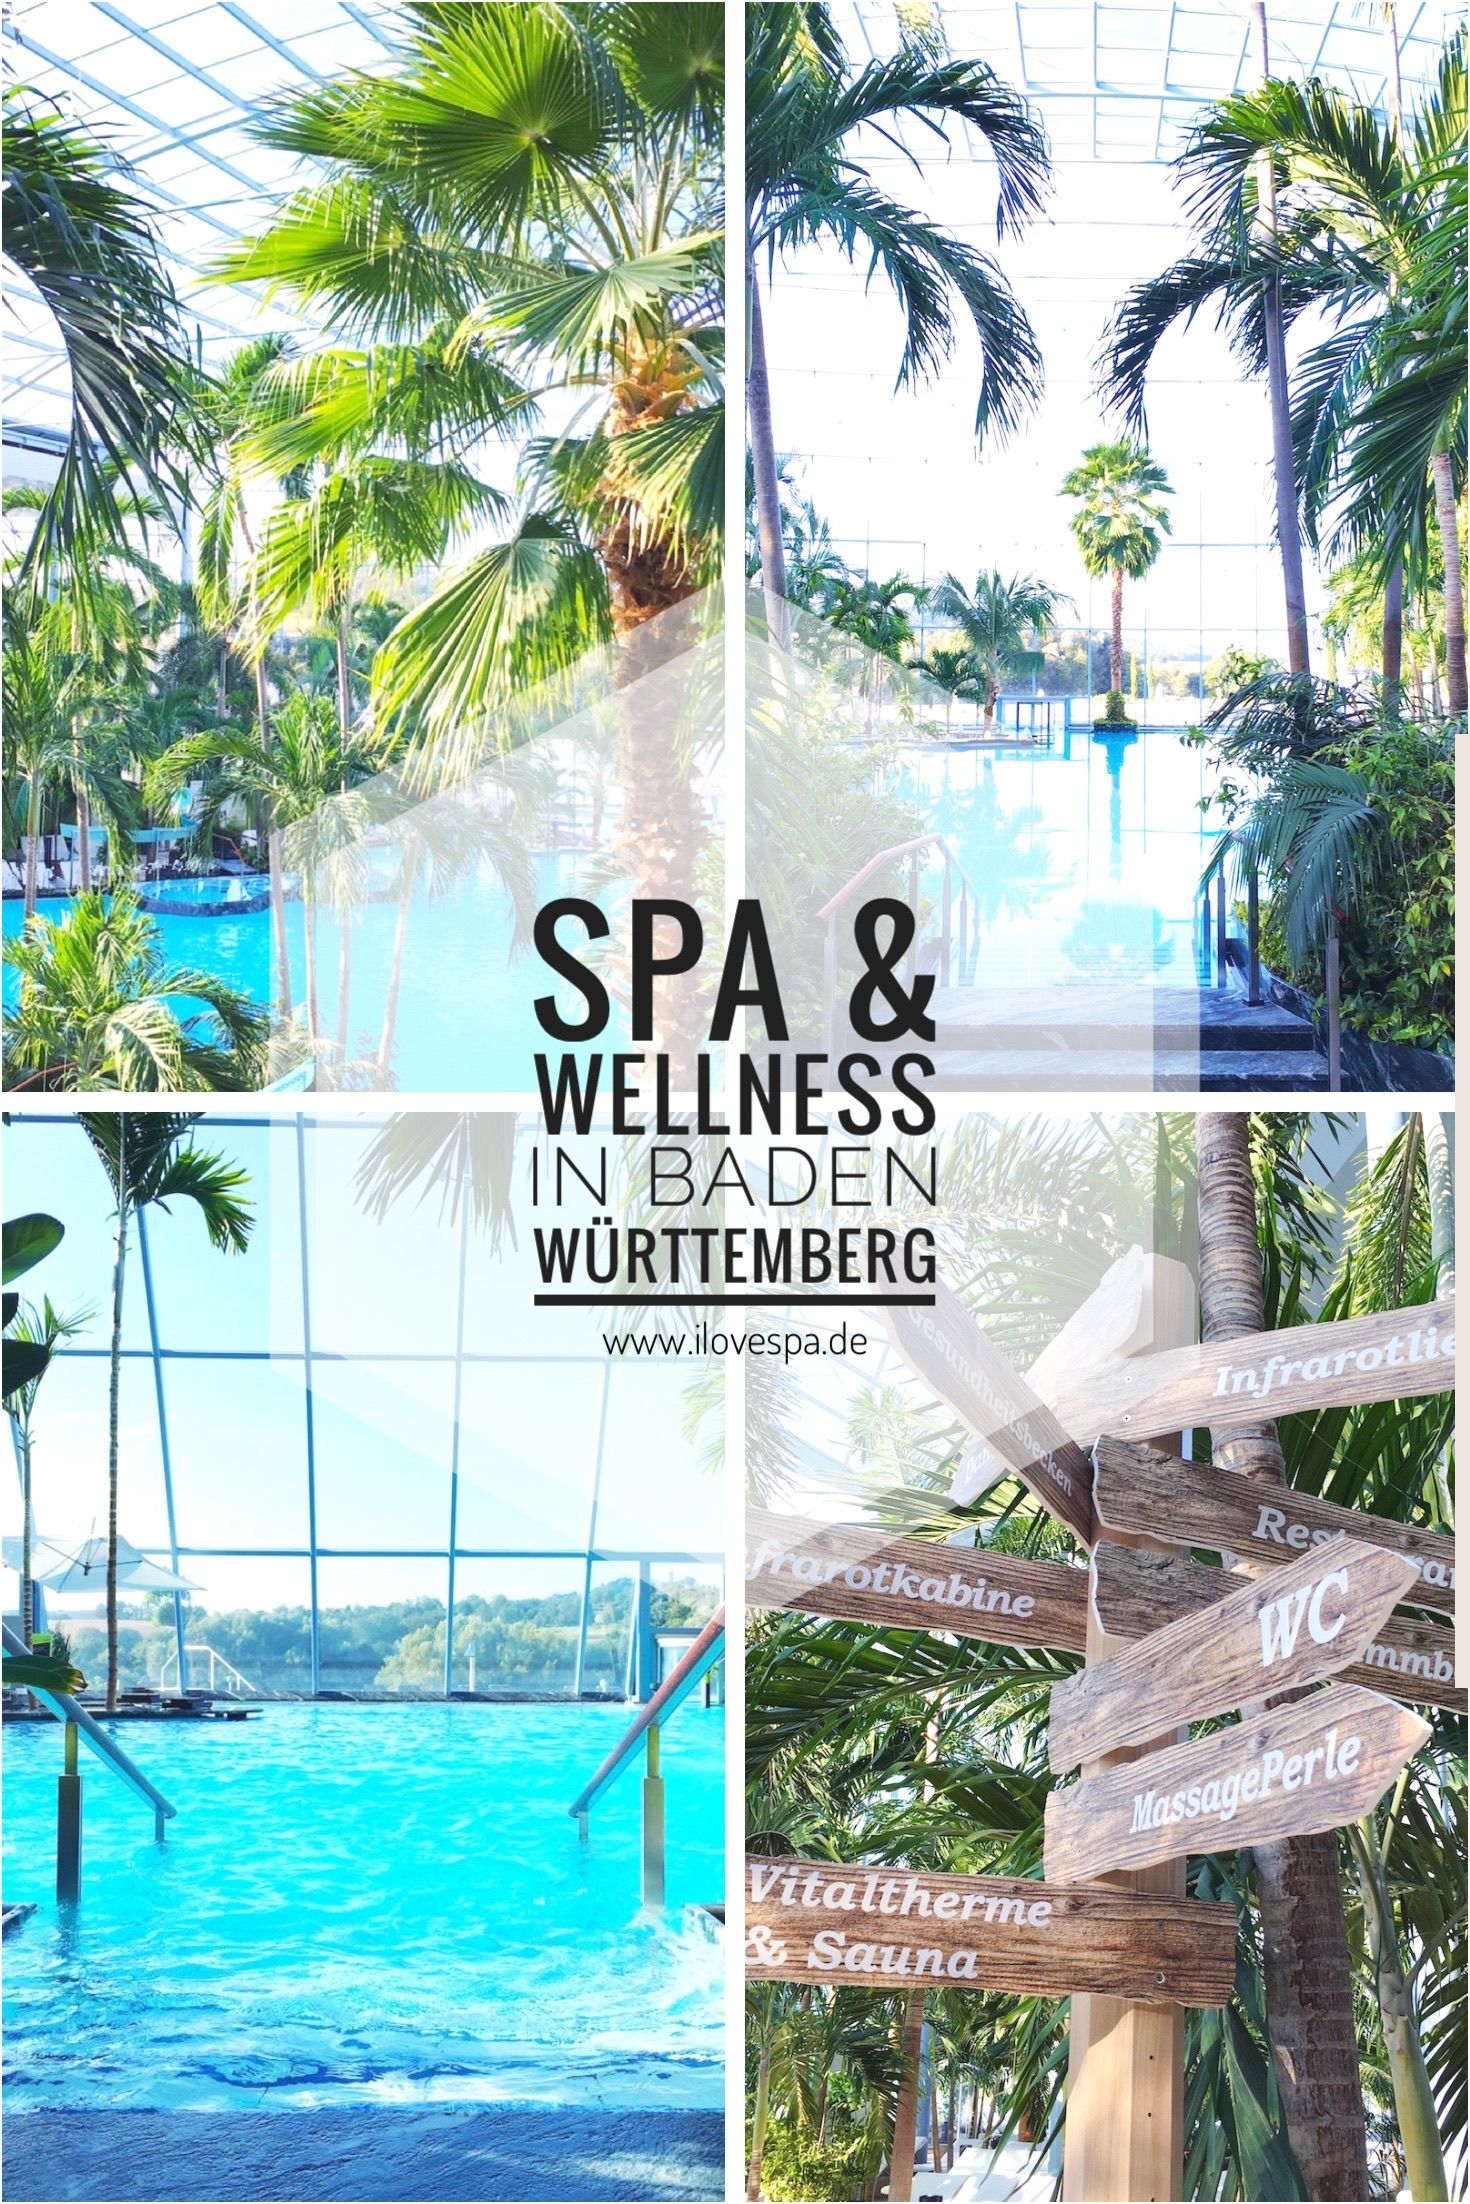 thermen badewelt sinsheim auf i love spa wellness blog spablogger pinterest therme. Black Bedroom Furniture Sets. Home Design Ideas